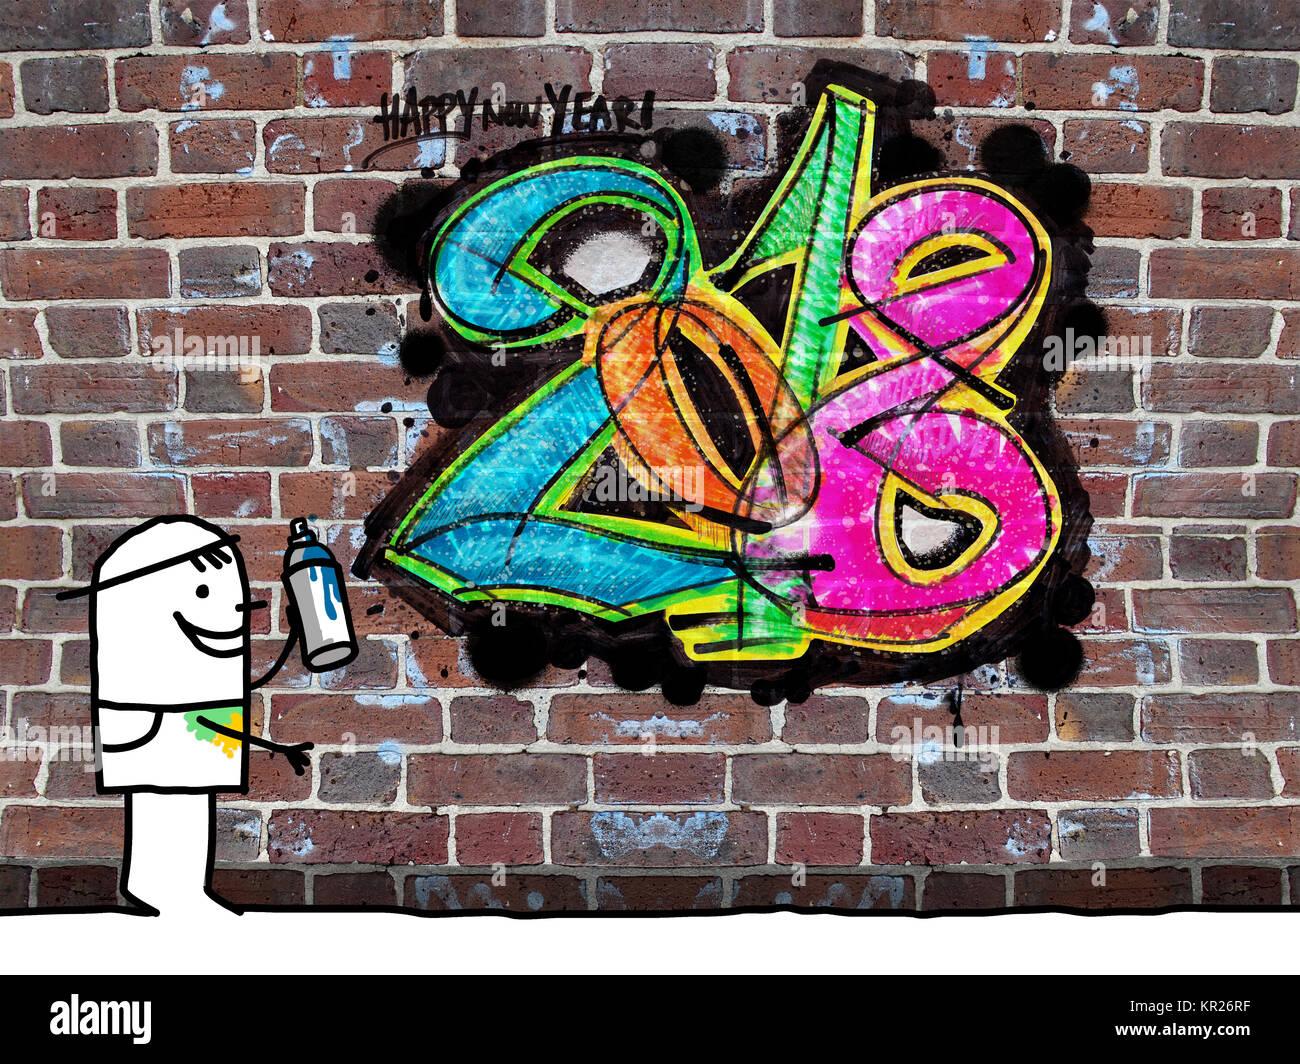 Painter and fresh graffiti 2018 on a wall